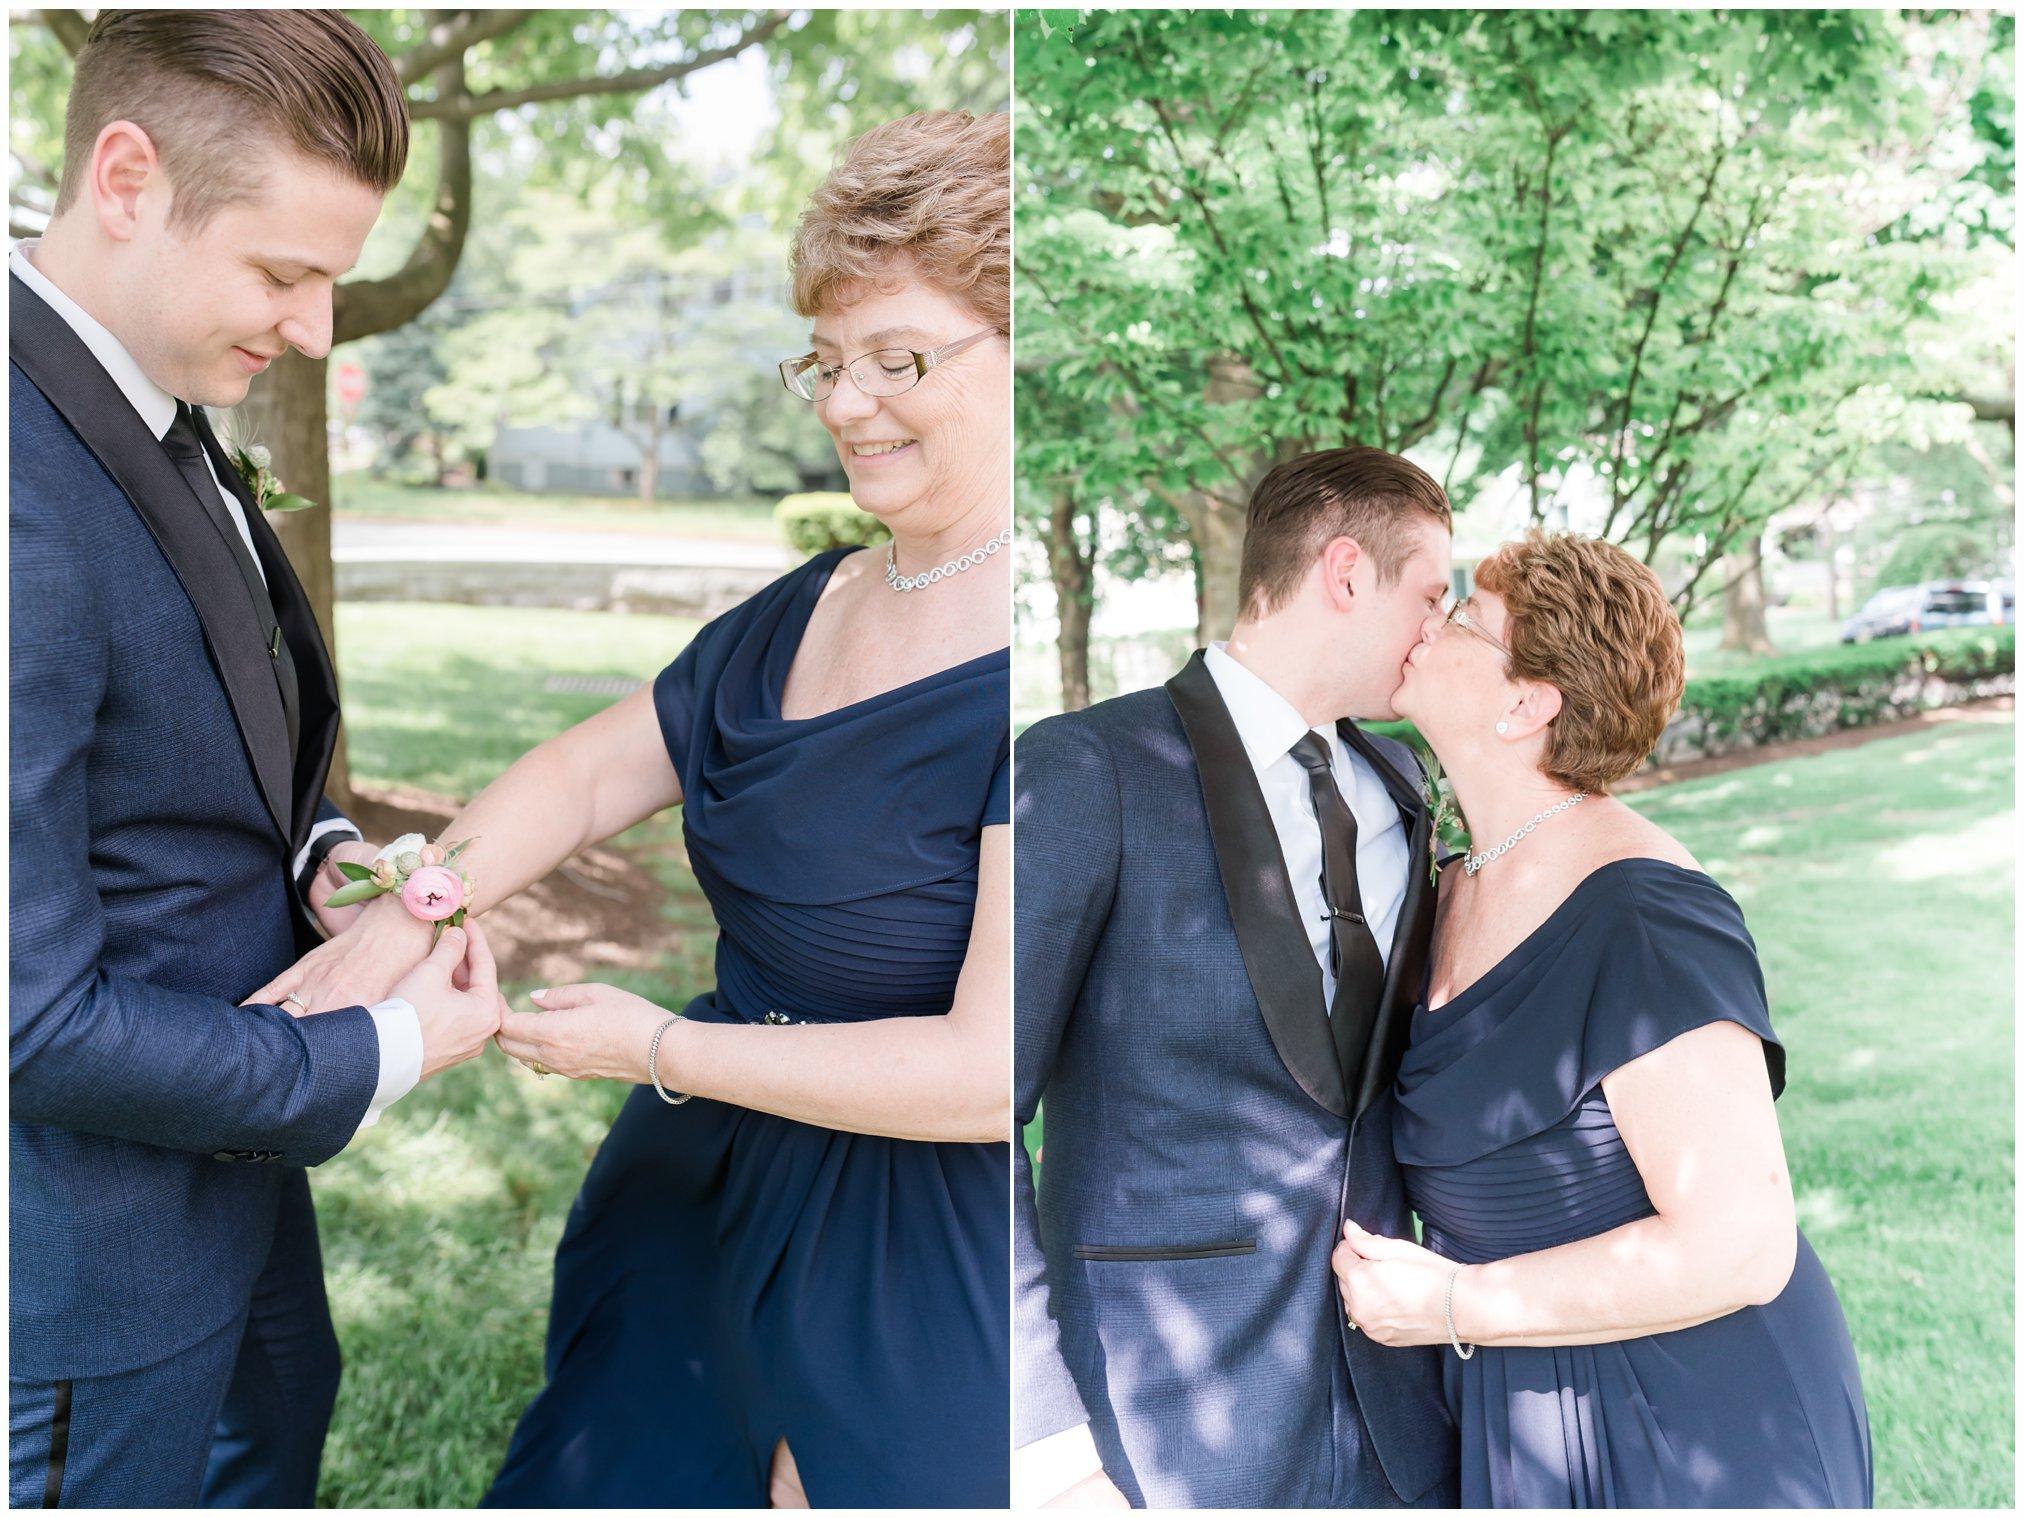 groom and mom on wedding day